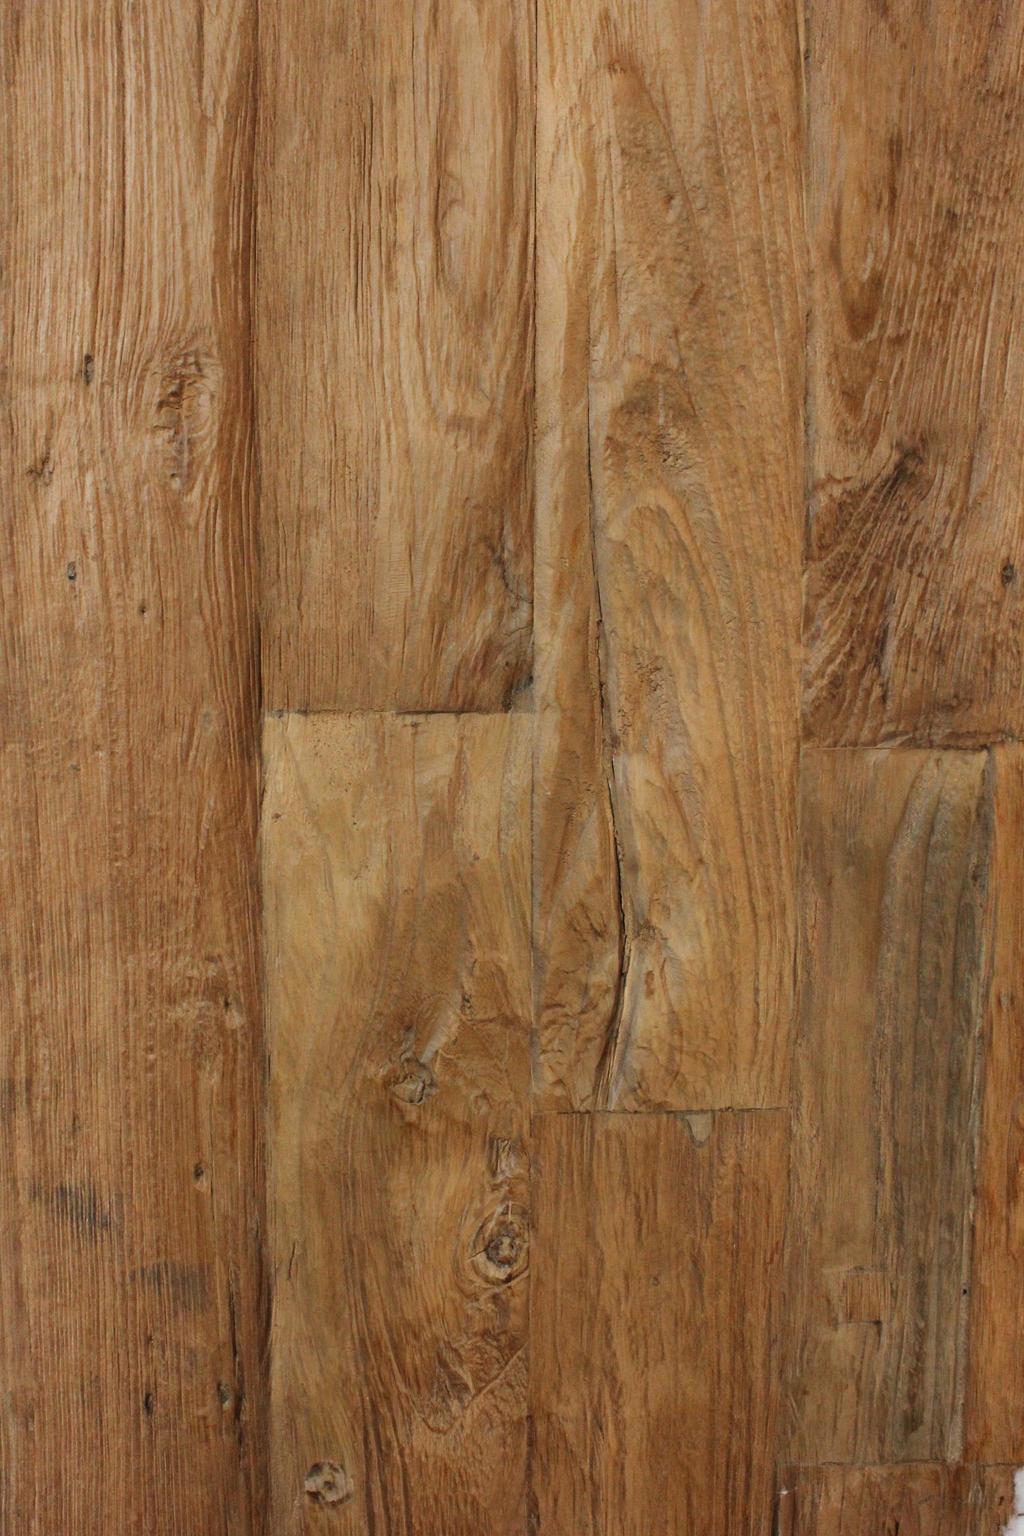 Wood table texture 3 by tamaraR-stock on DeviantArt